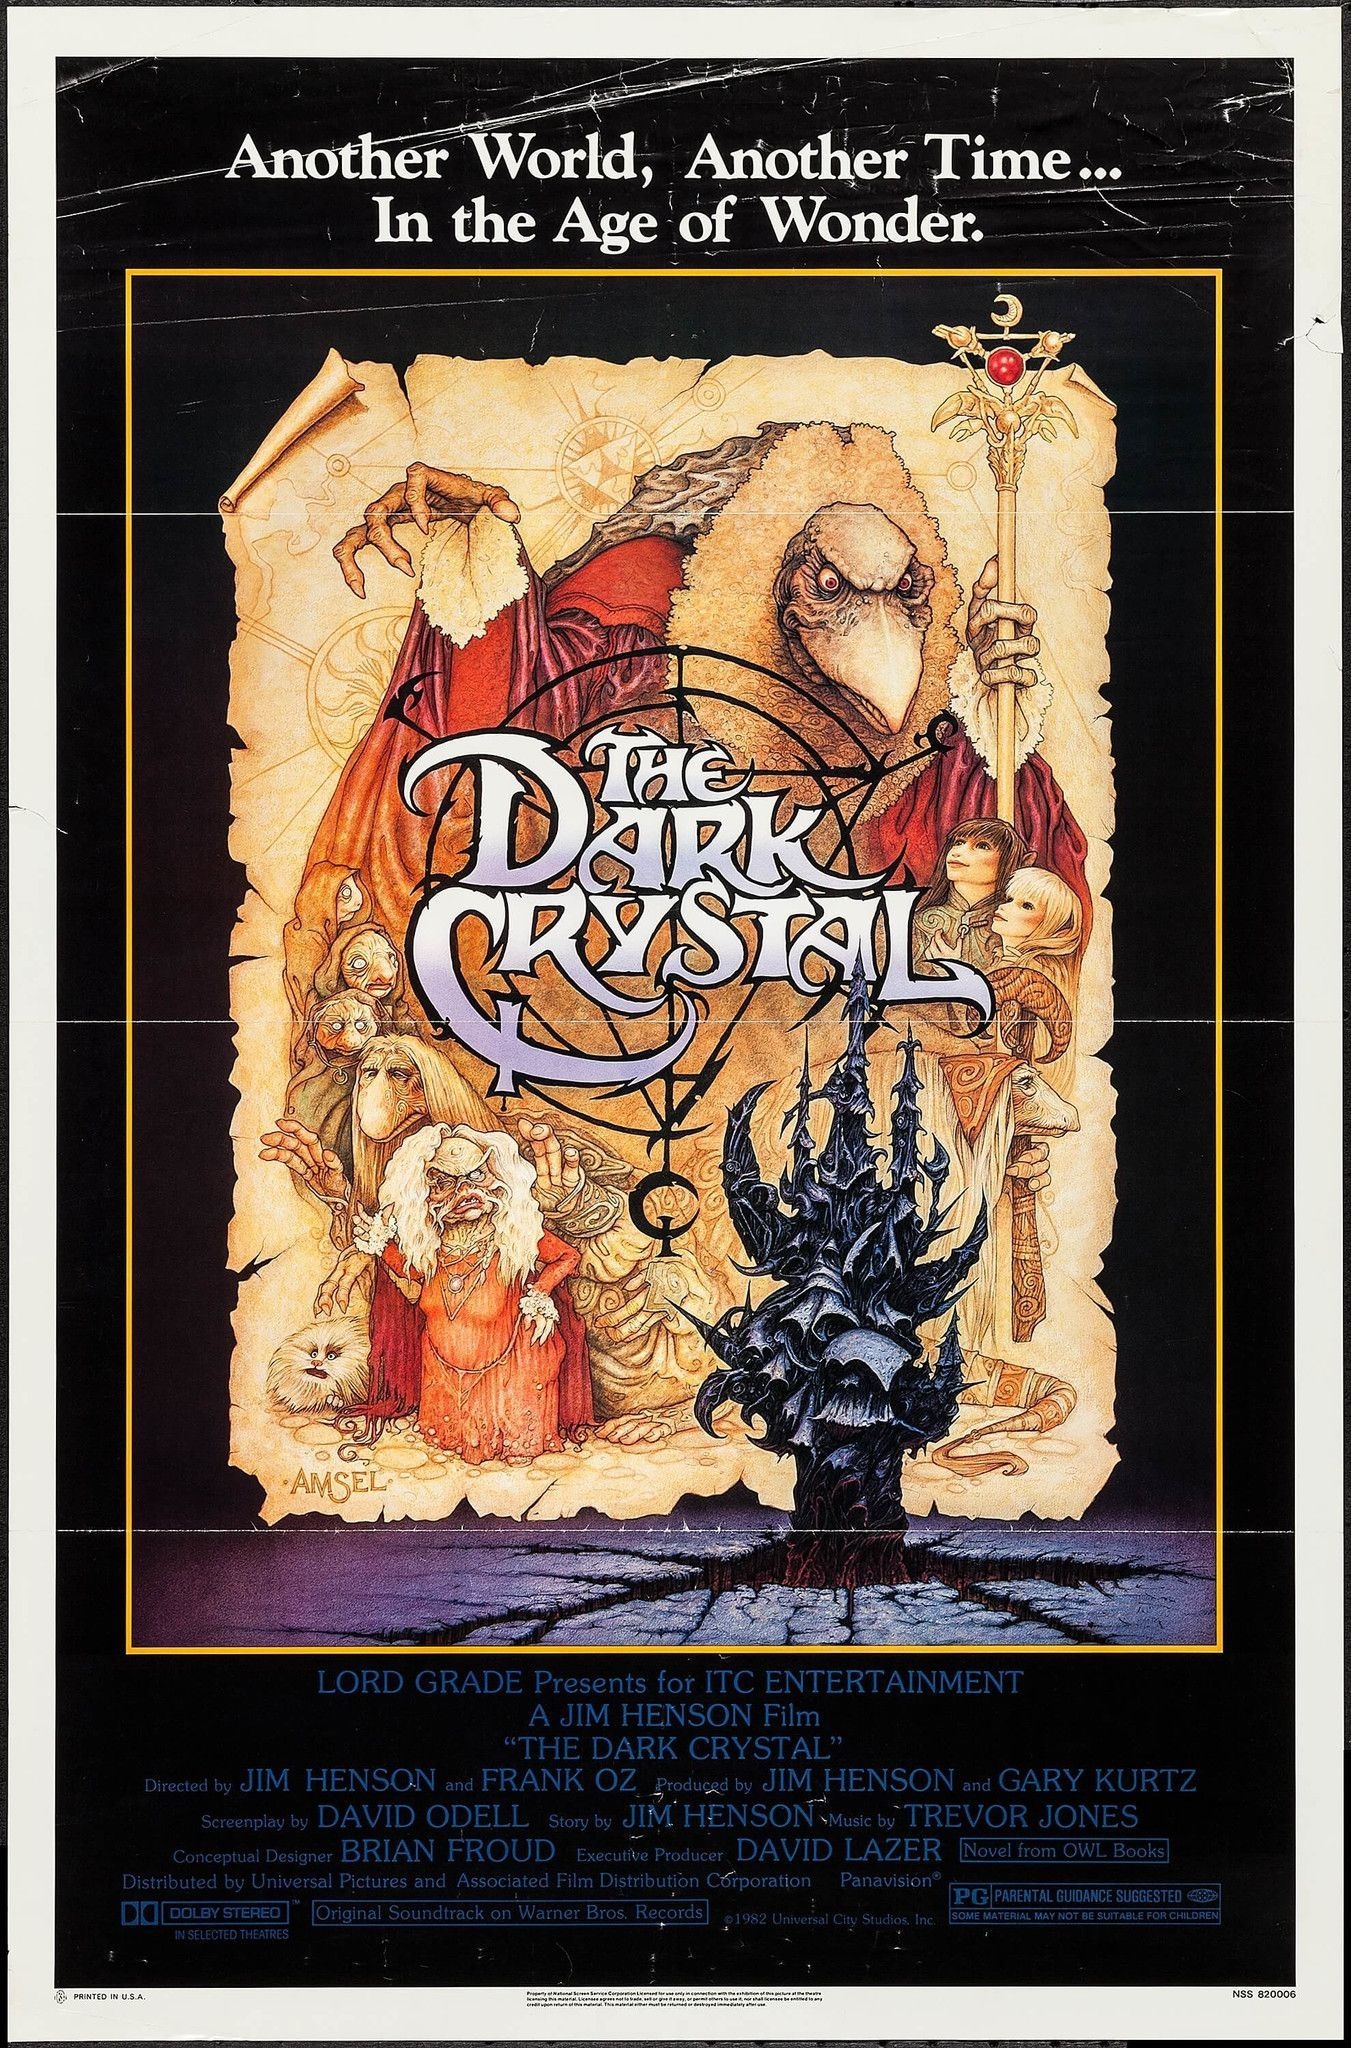 The Dark Crystal Origi...